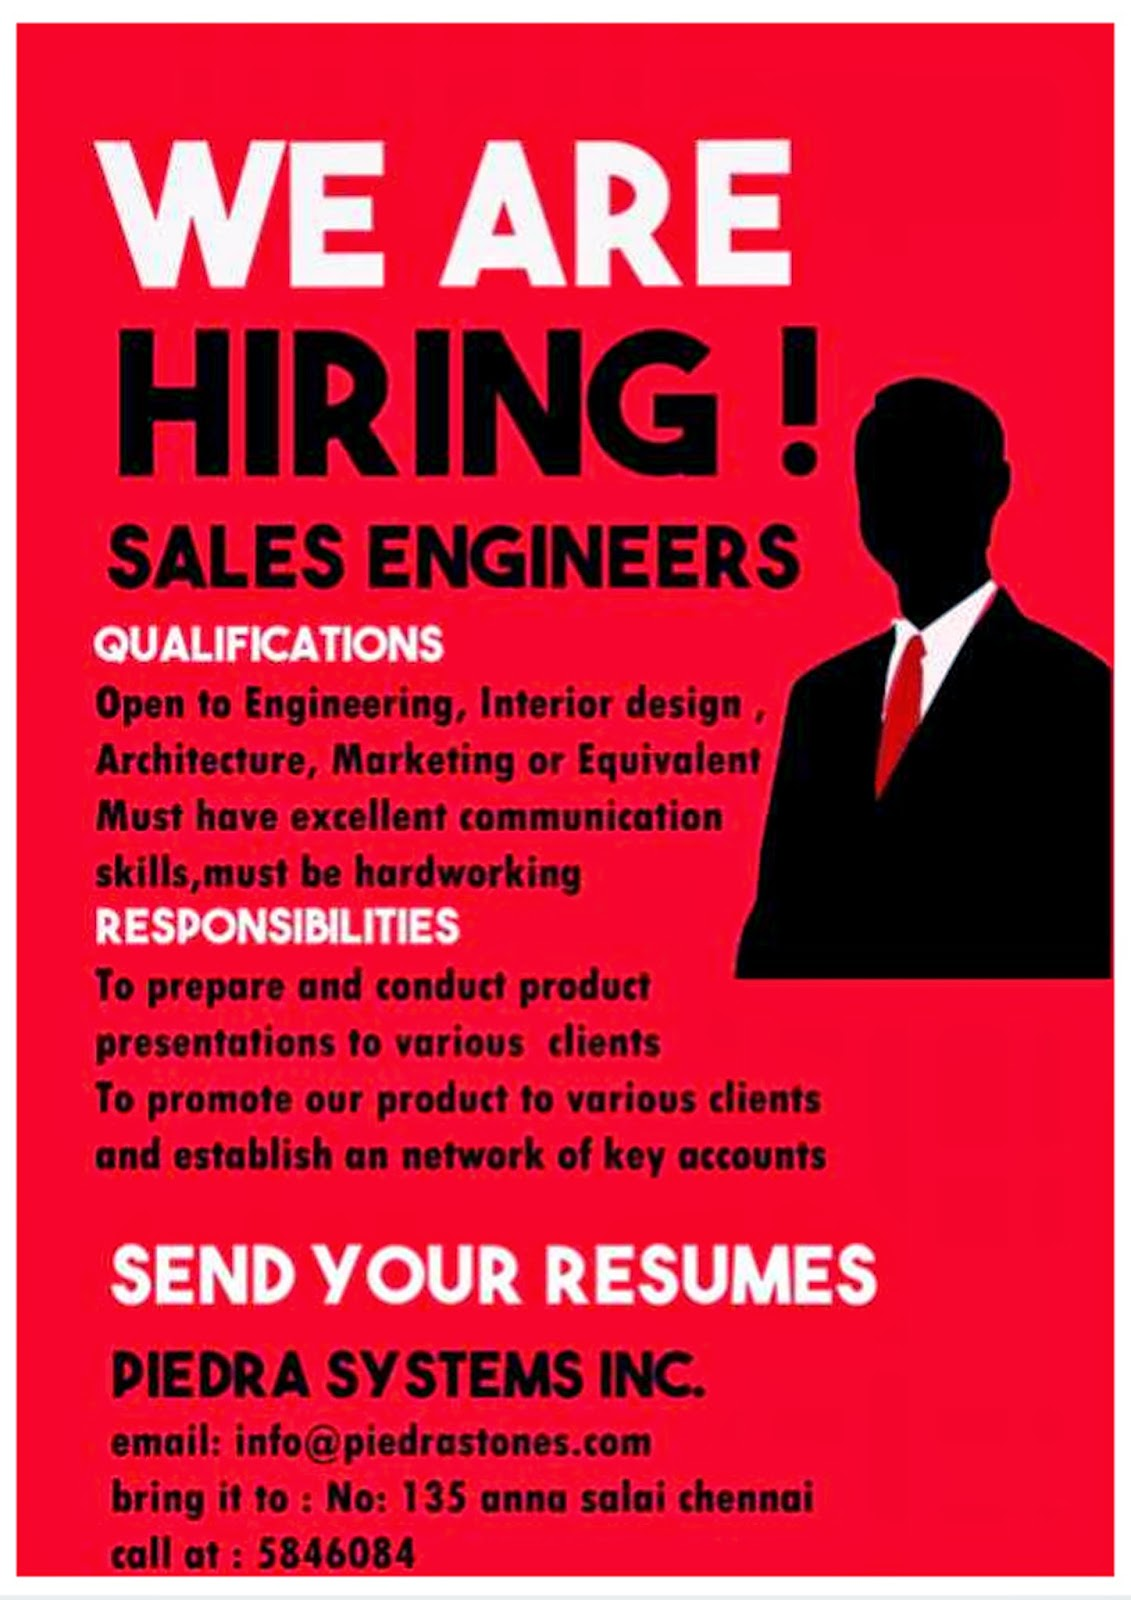 Pics for job vacancy poster template Vacancy for interior designer